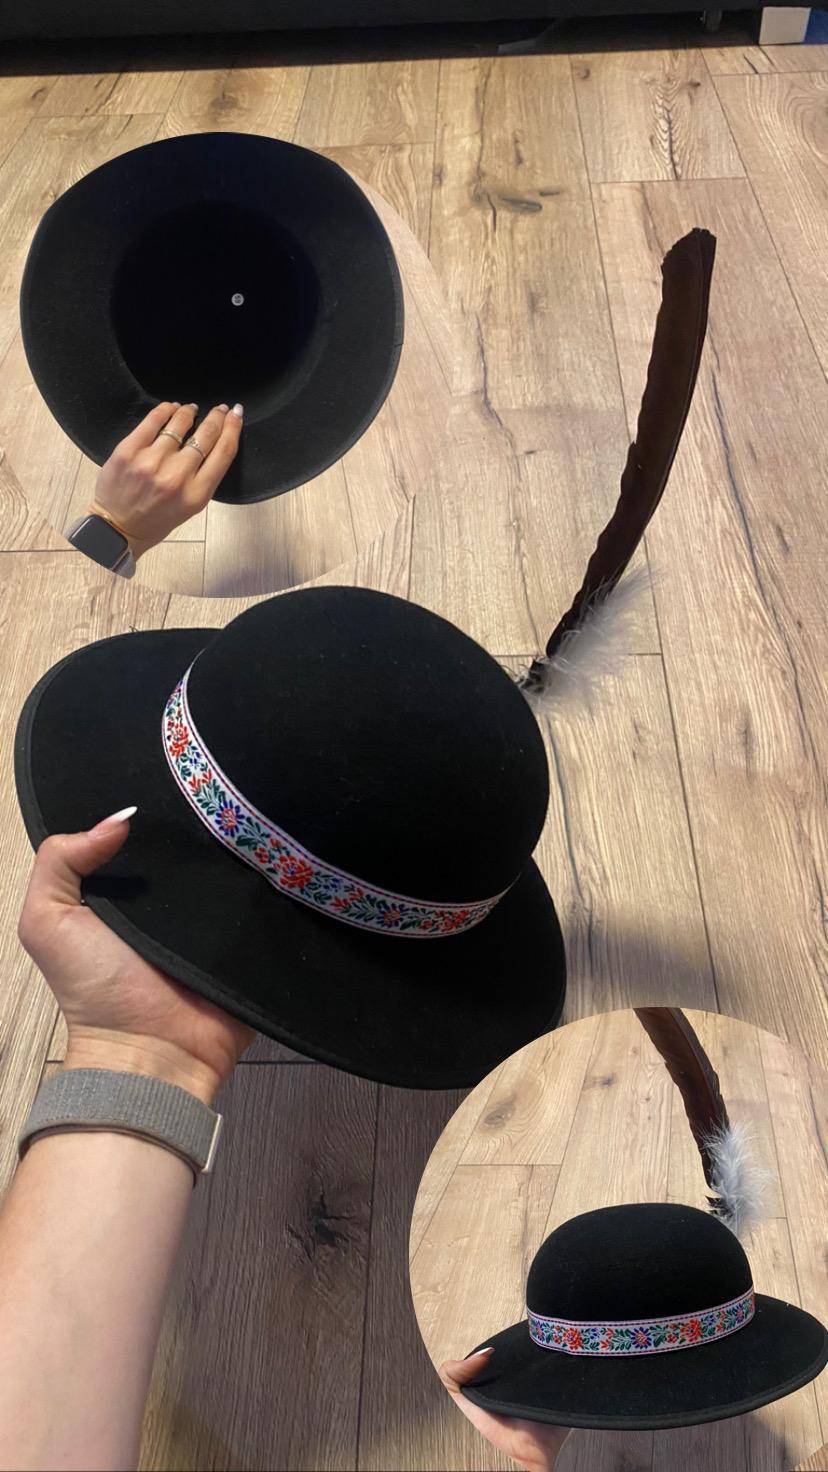 klobúk a šatka - Obrázok č. 1